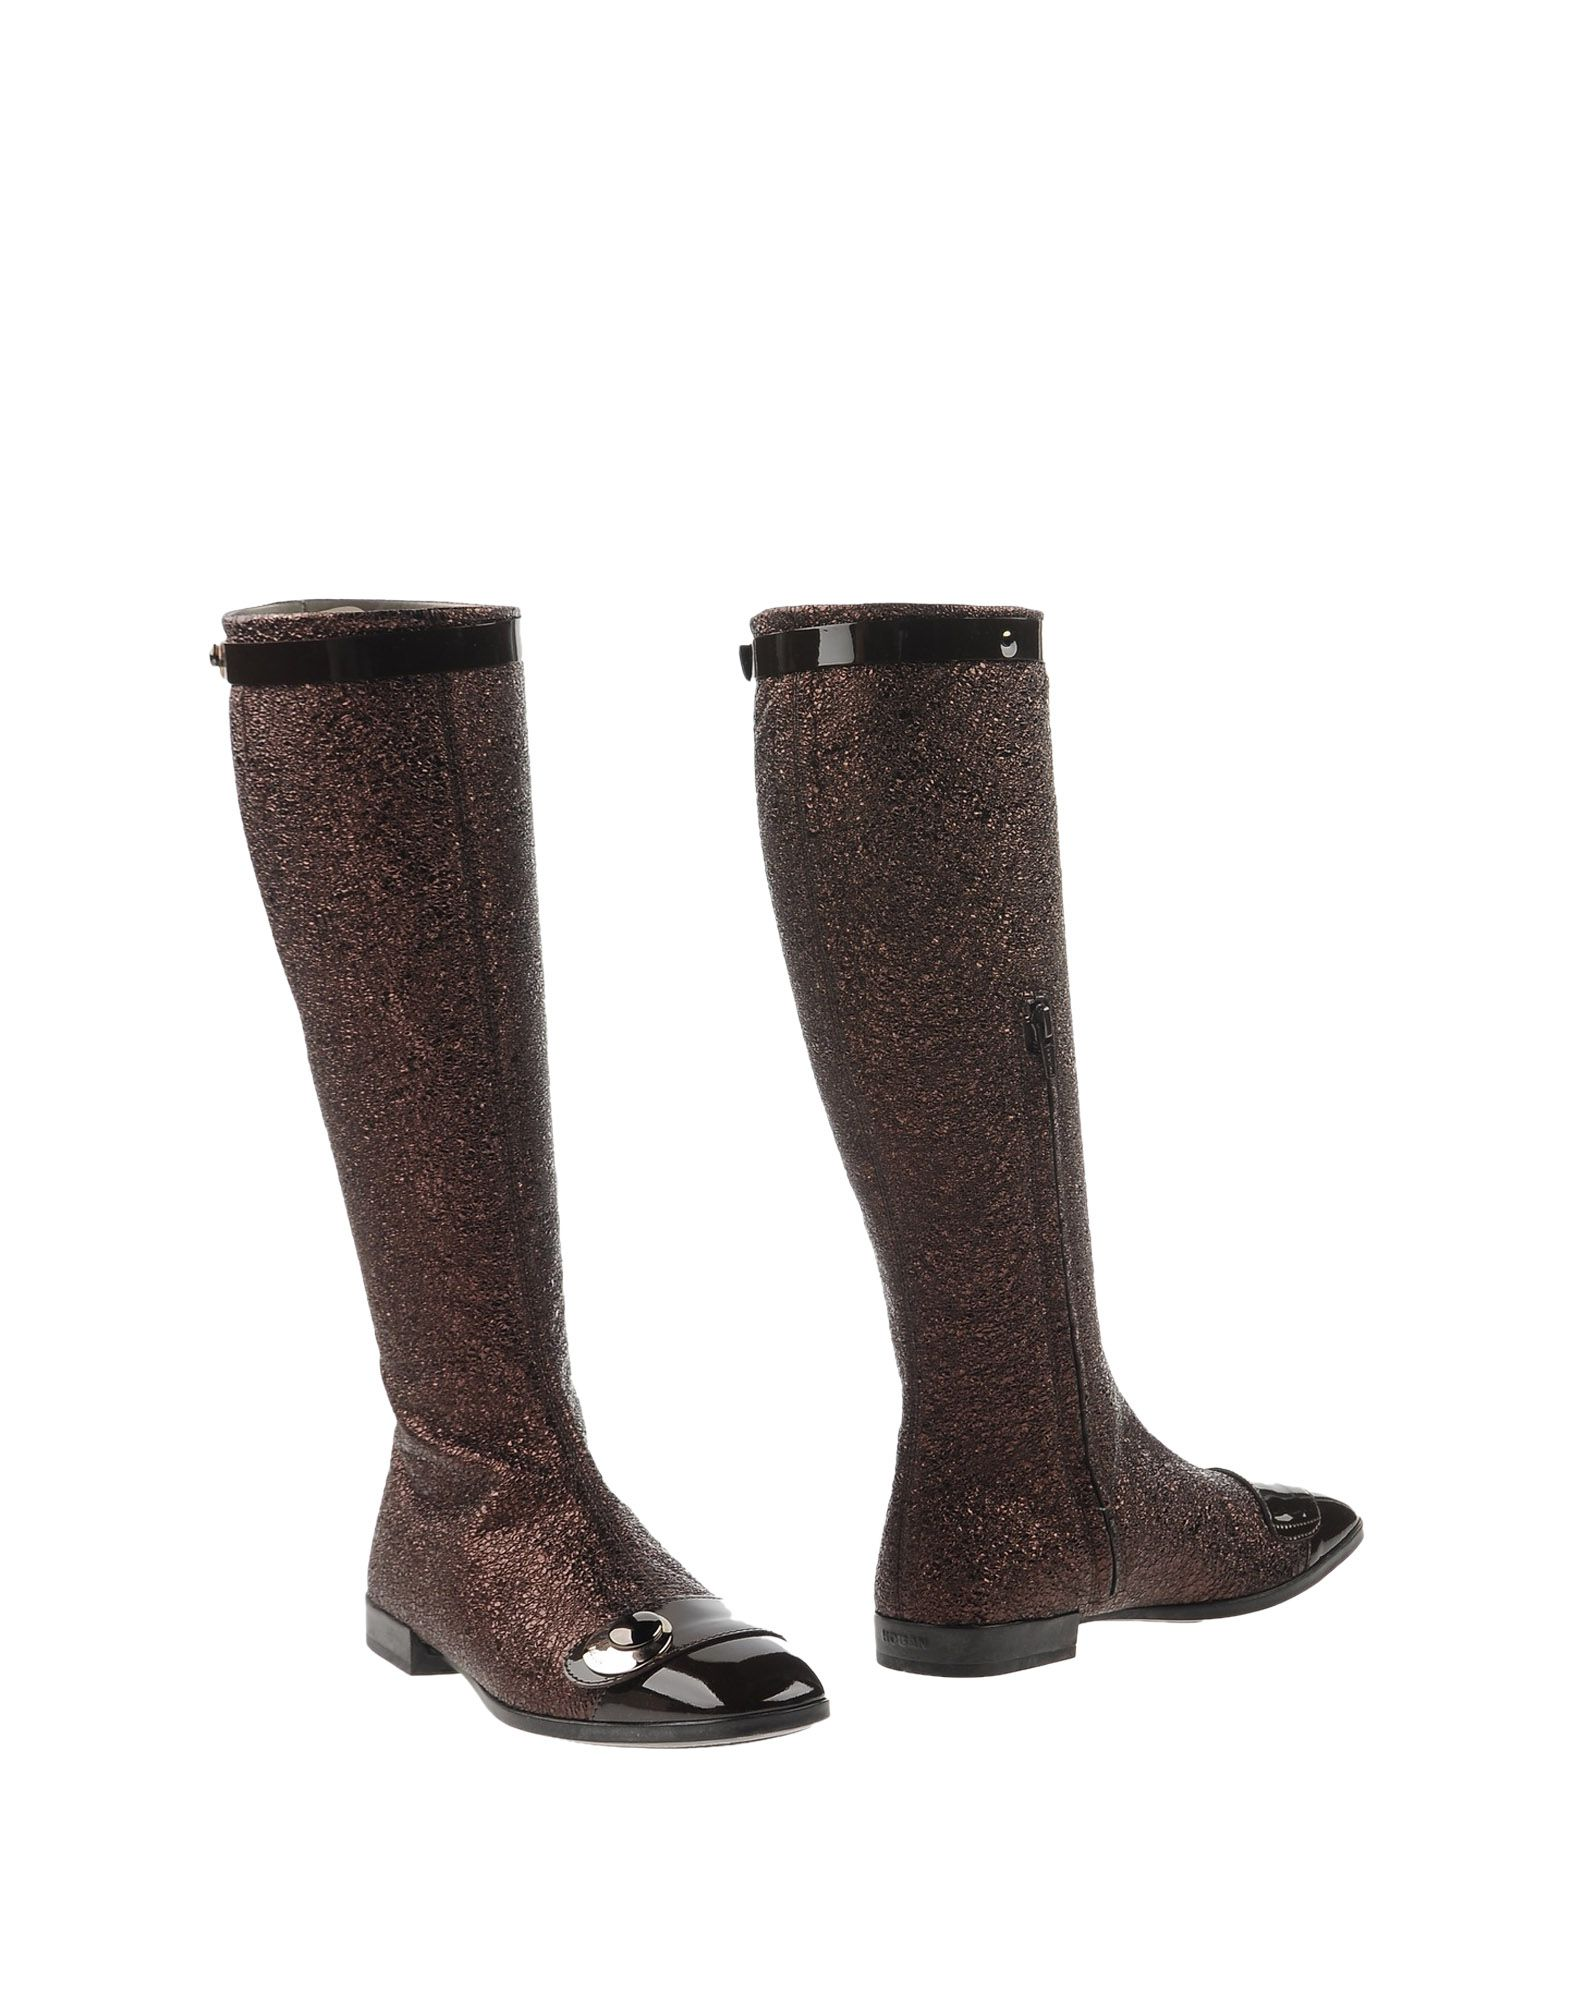 Hogan Boots - Women Hogan Boots online on on on  United Kingdom - 11087180JB 6badea